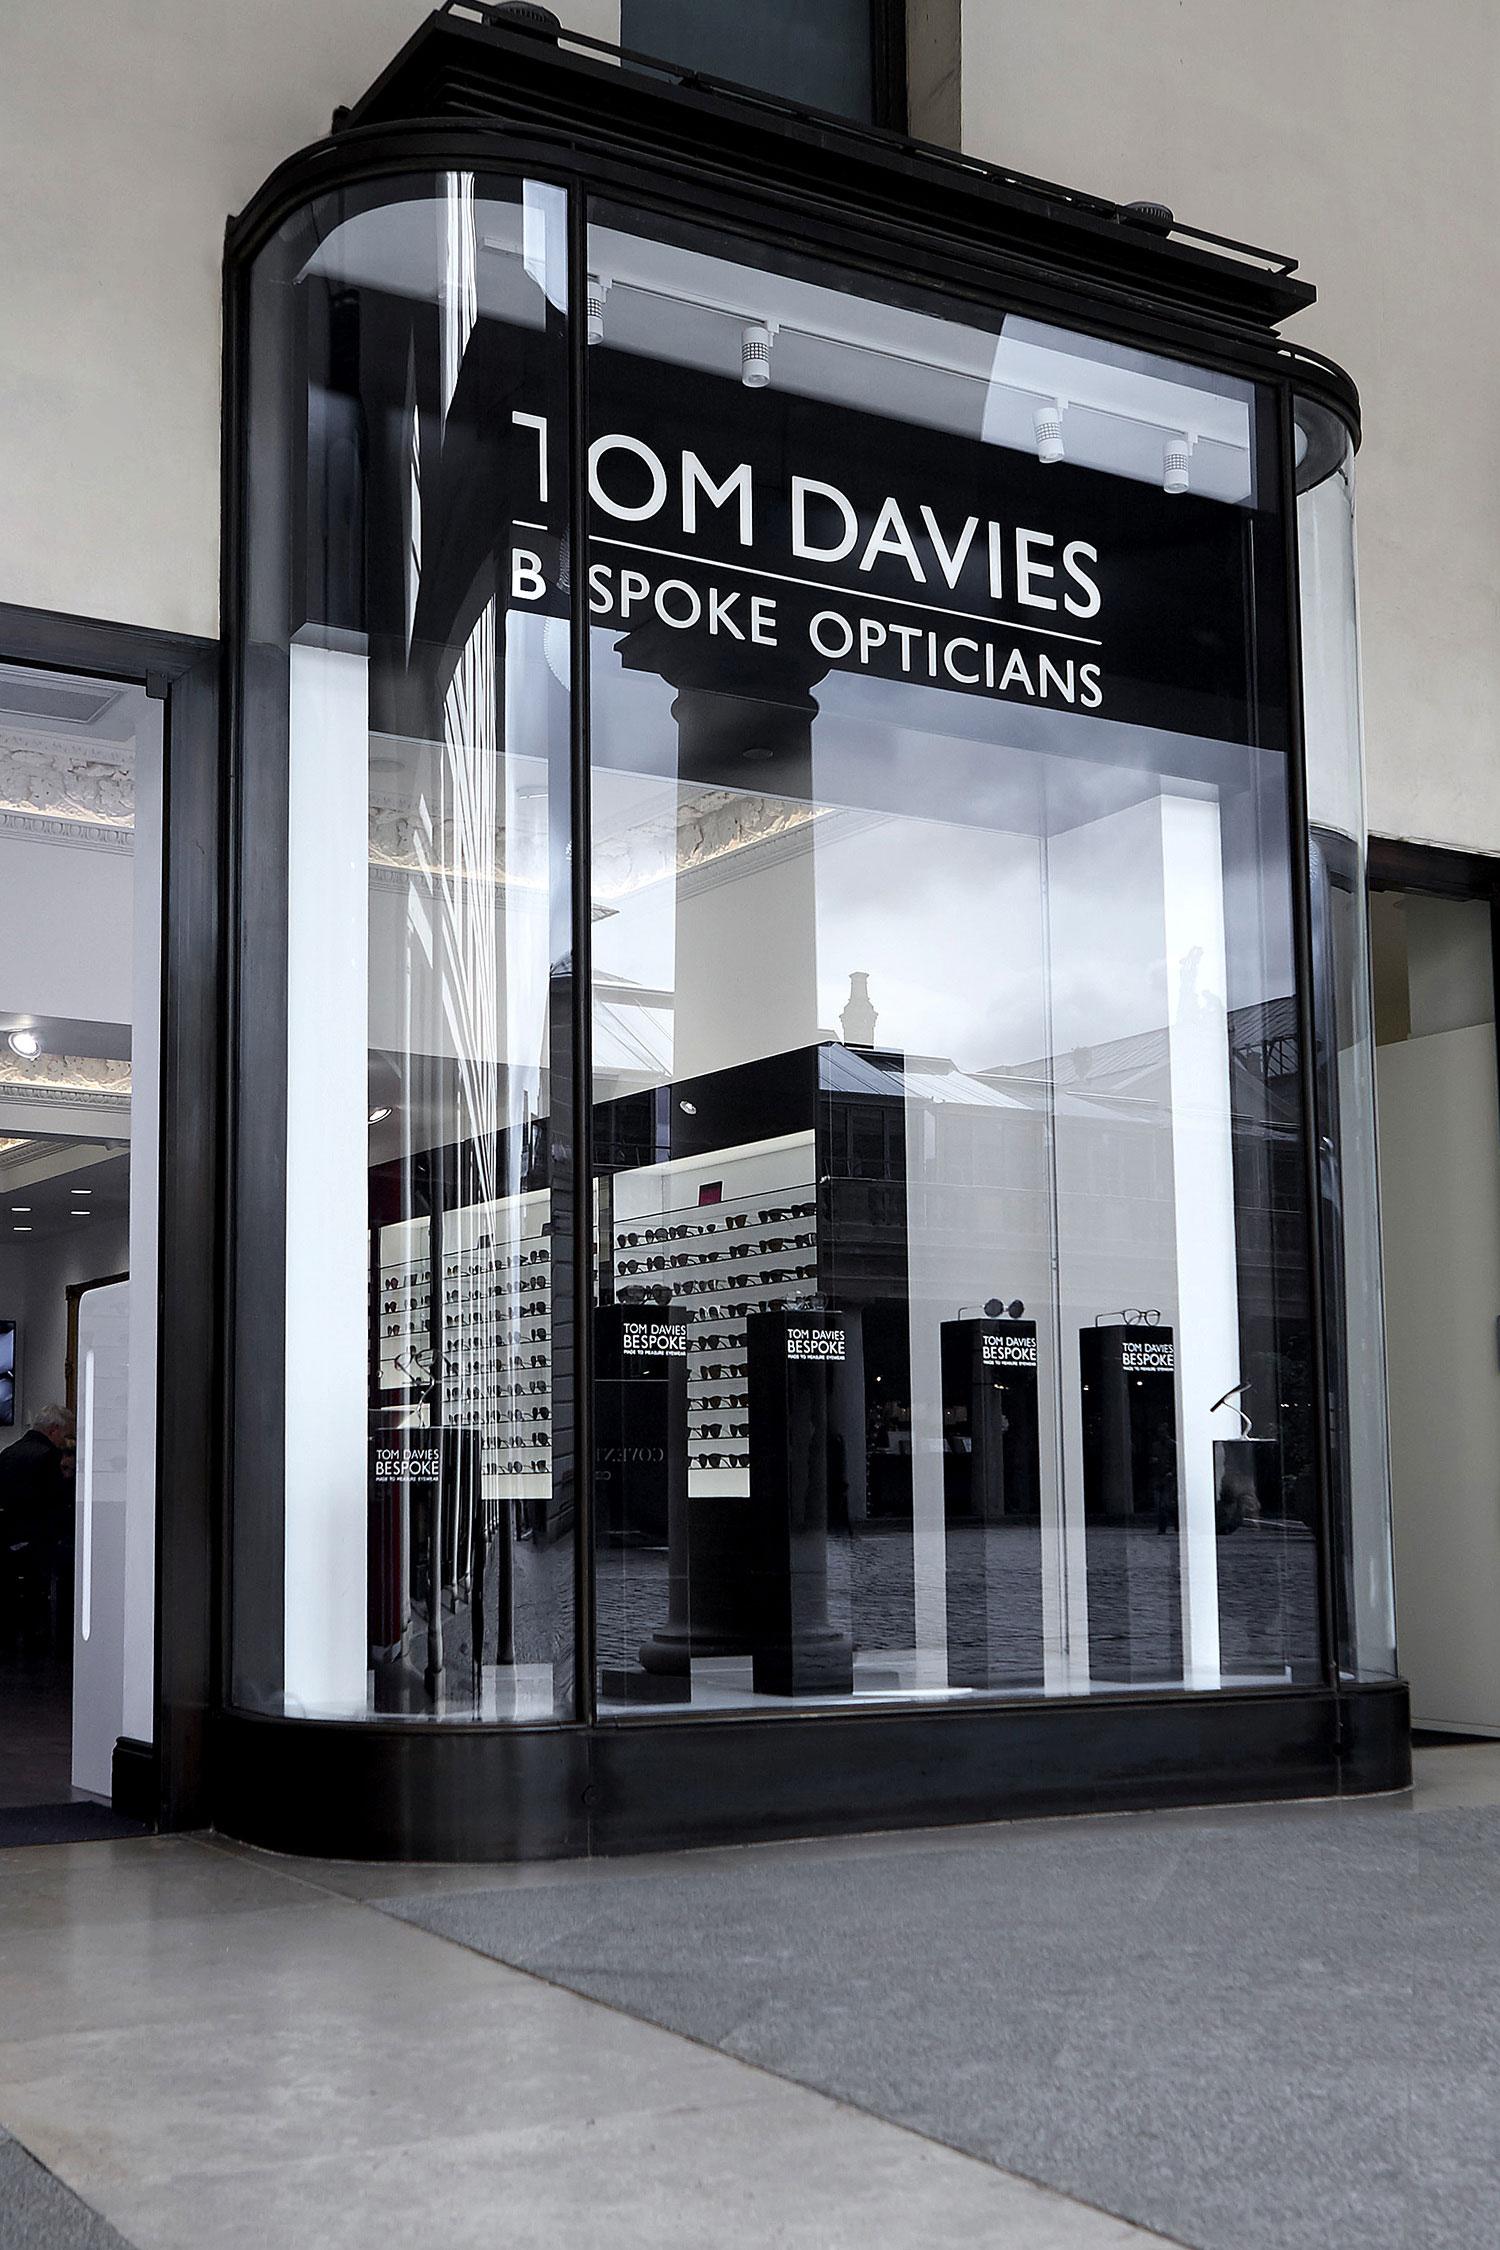 Tom Davies Bespoke Opticians store in Covent Garden